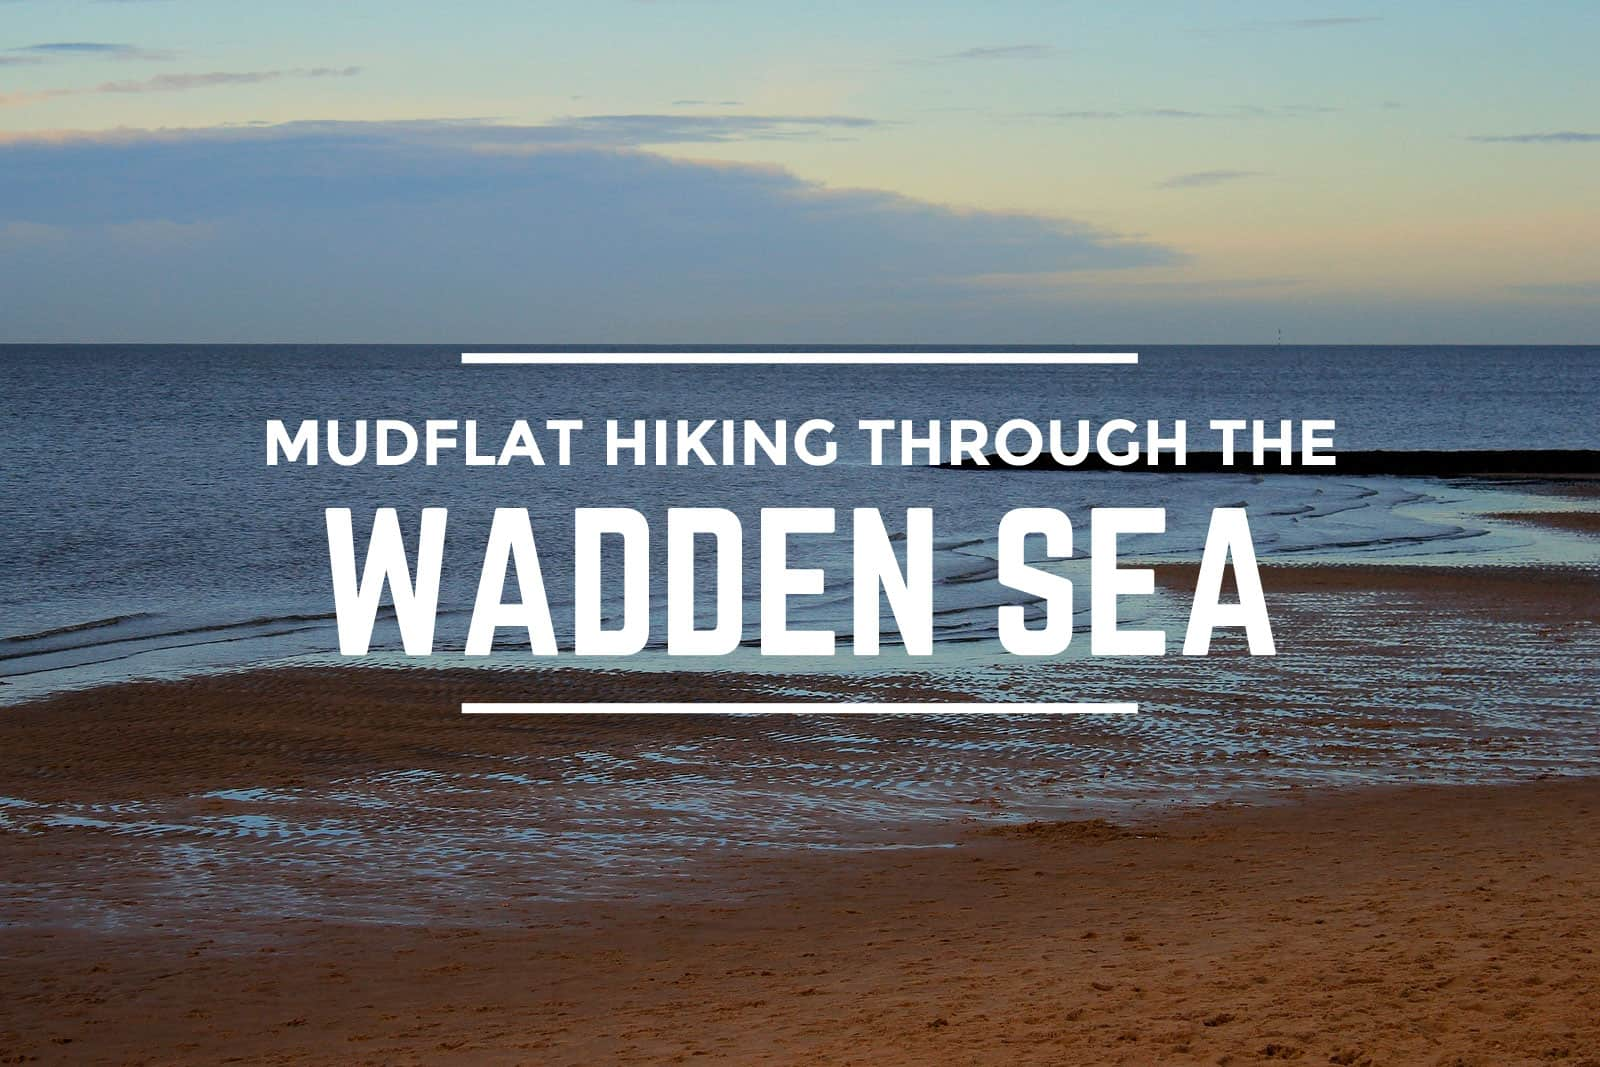 Mudflat Hiking Through the Wadden Sea